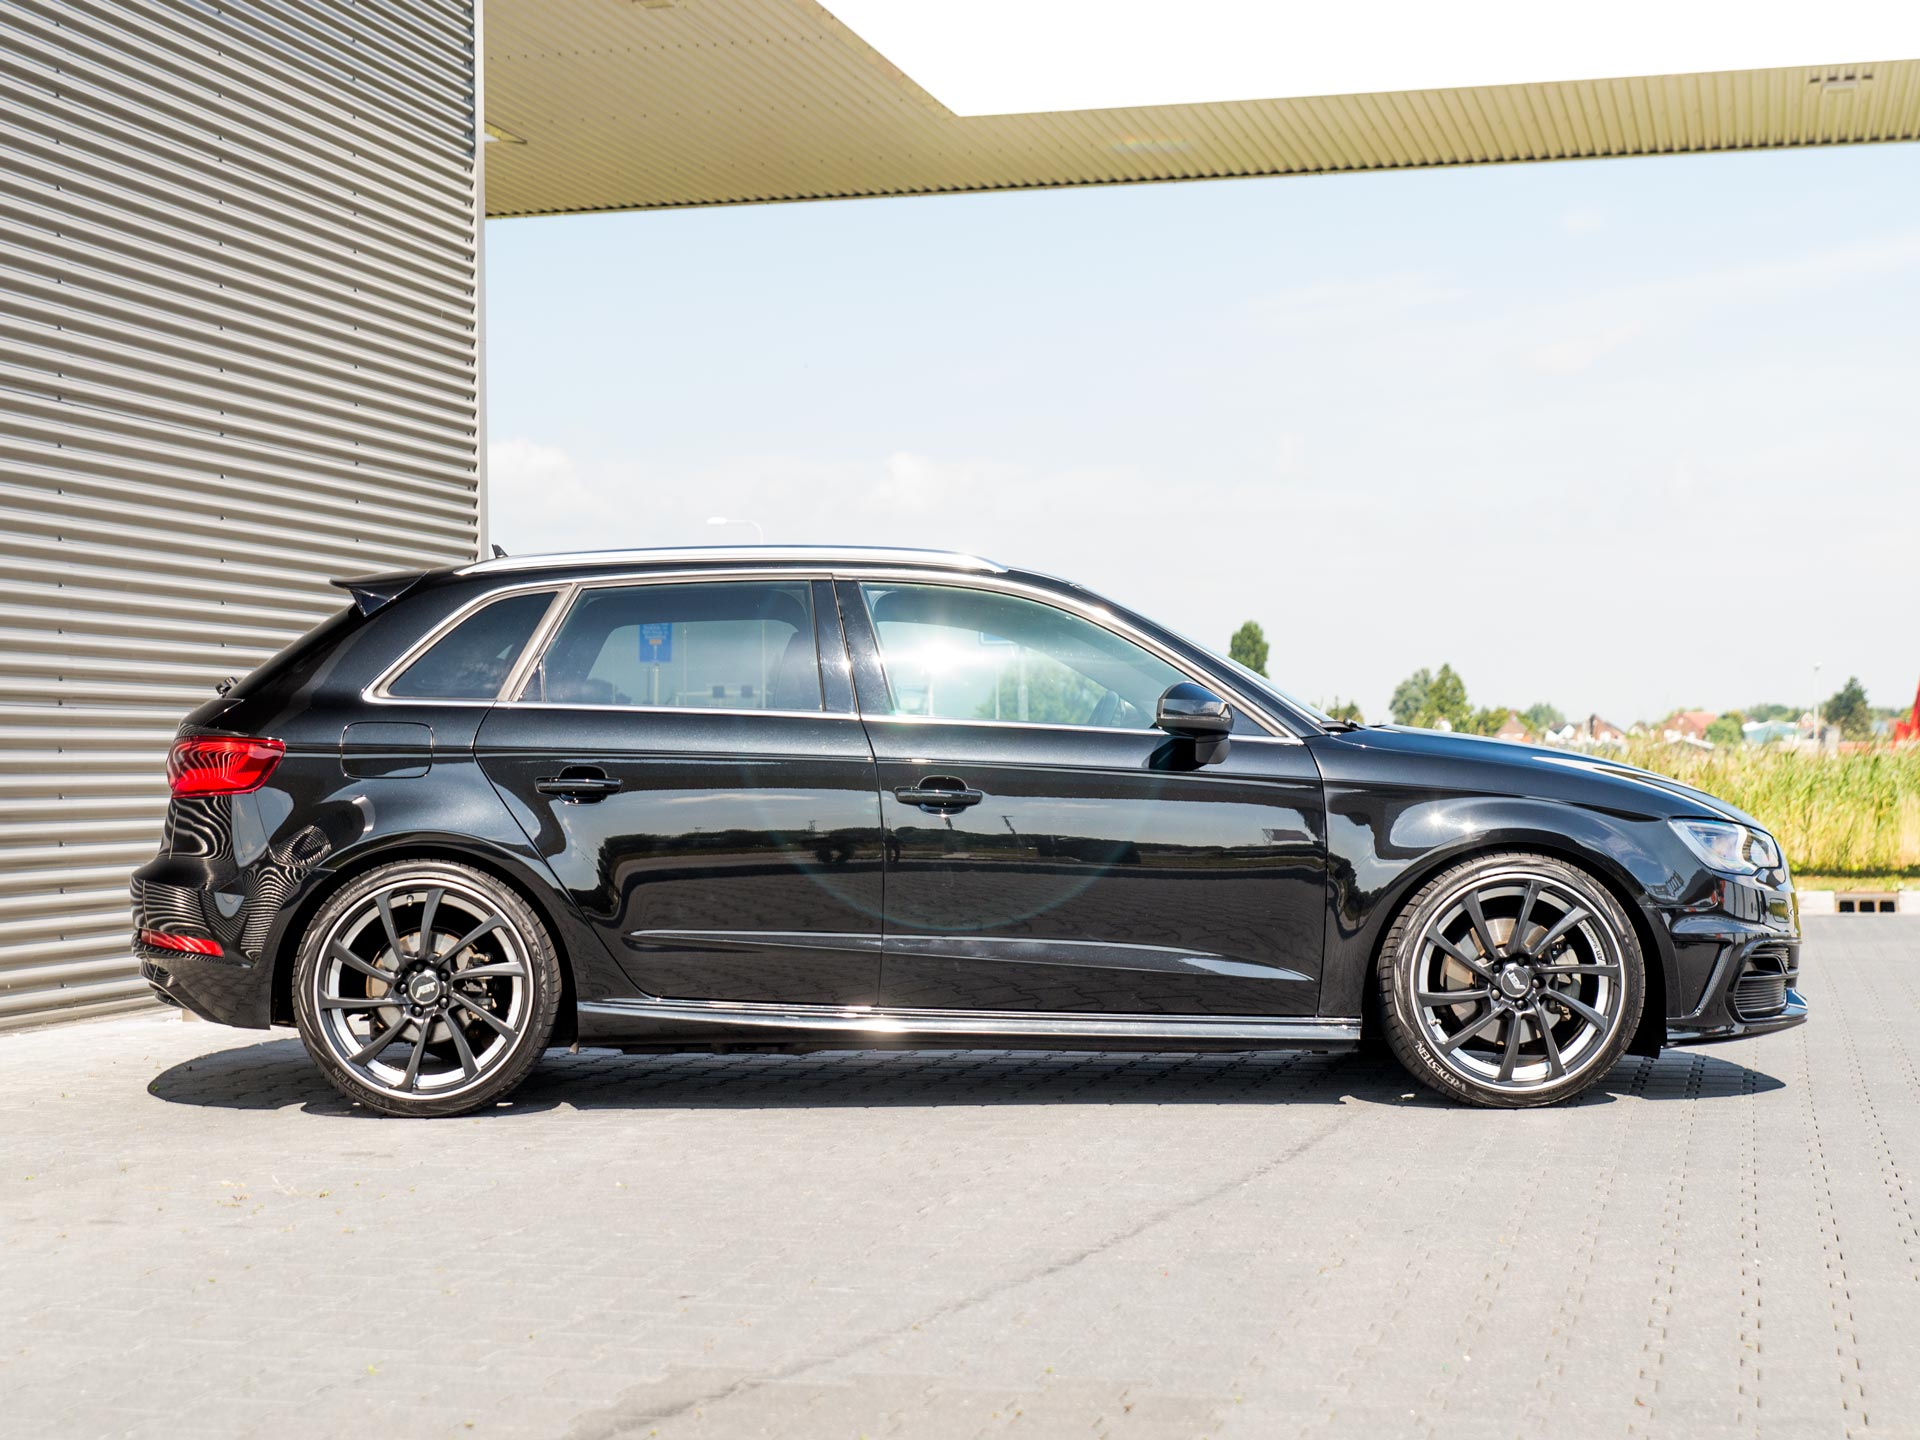 Tweedehands Audi A3 Sportback ABT